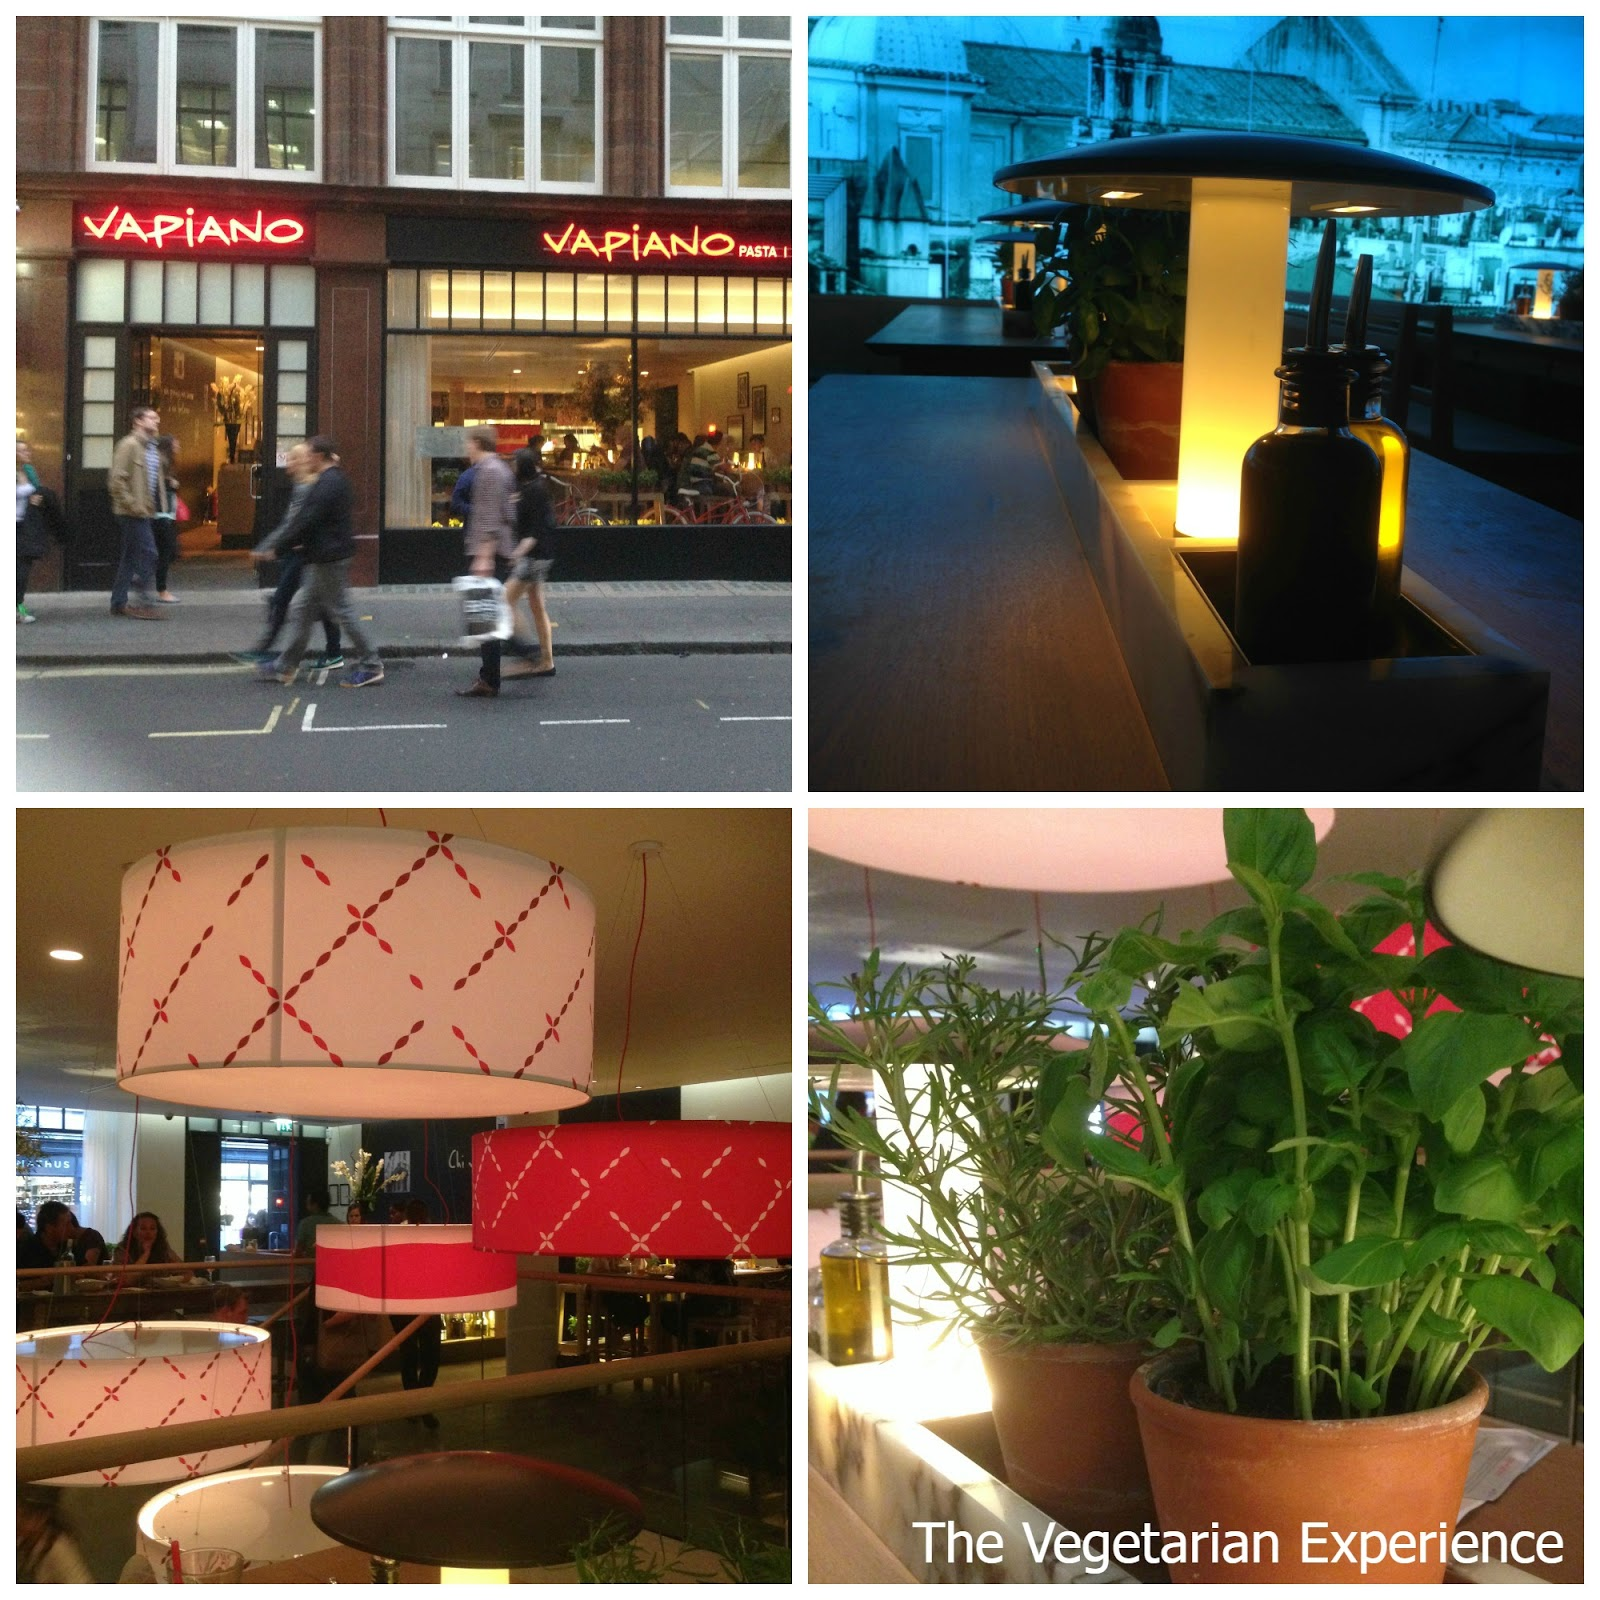 Vapiano Restaurant London